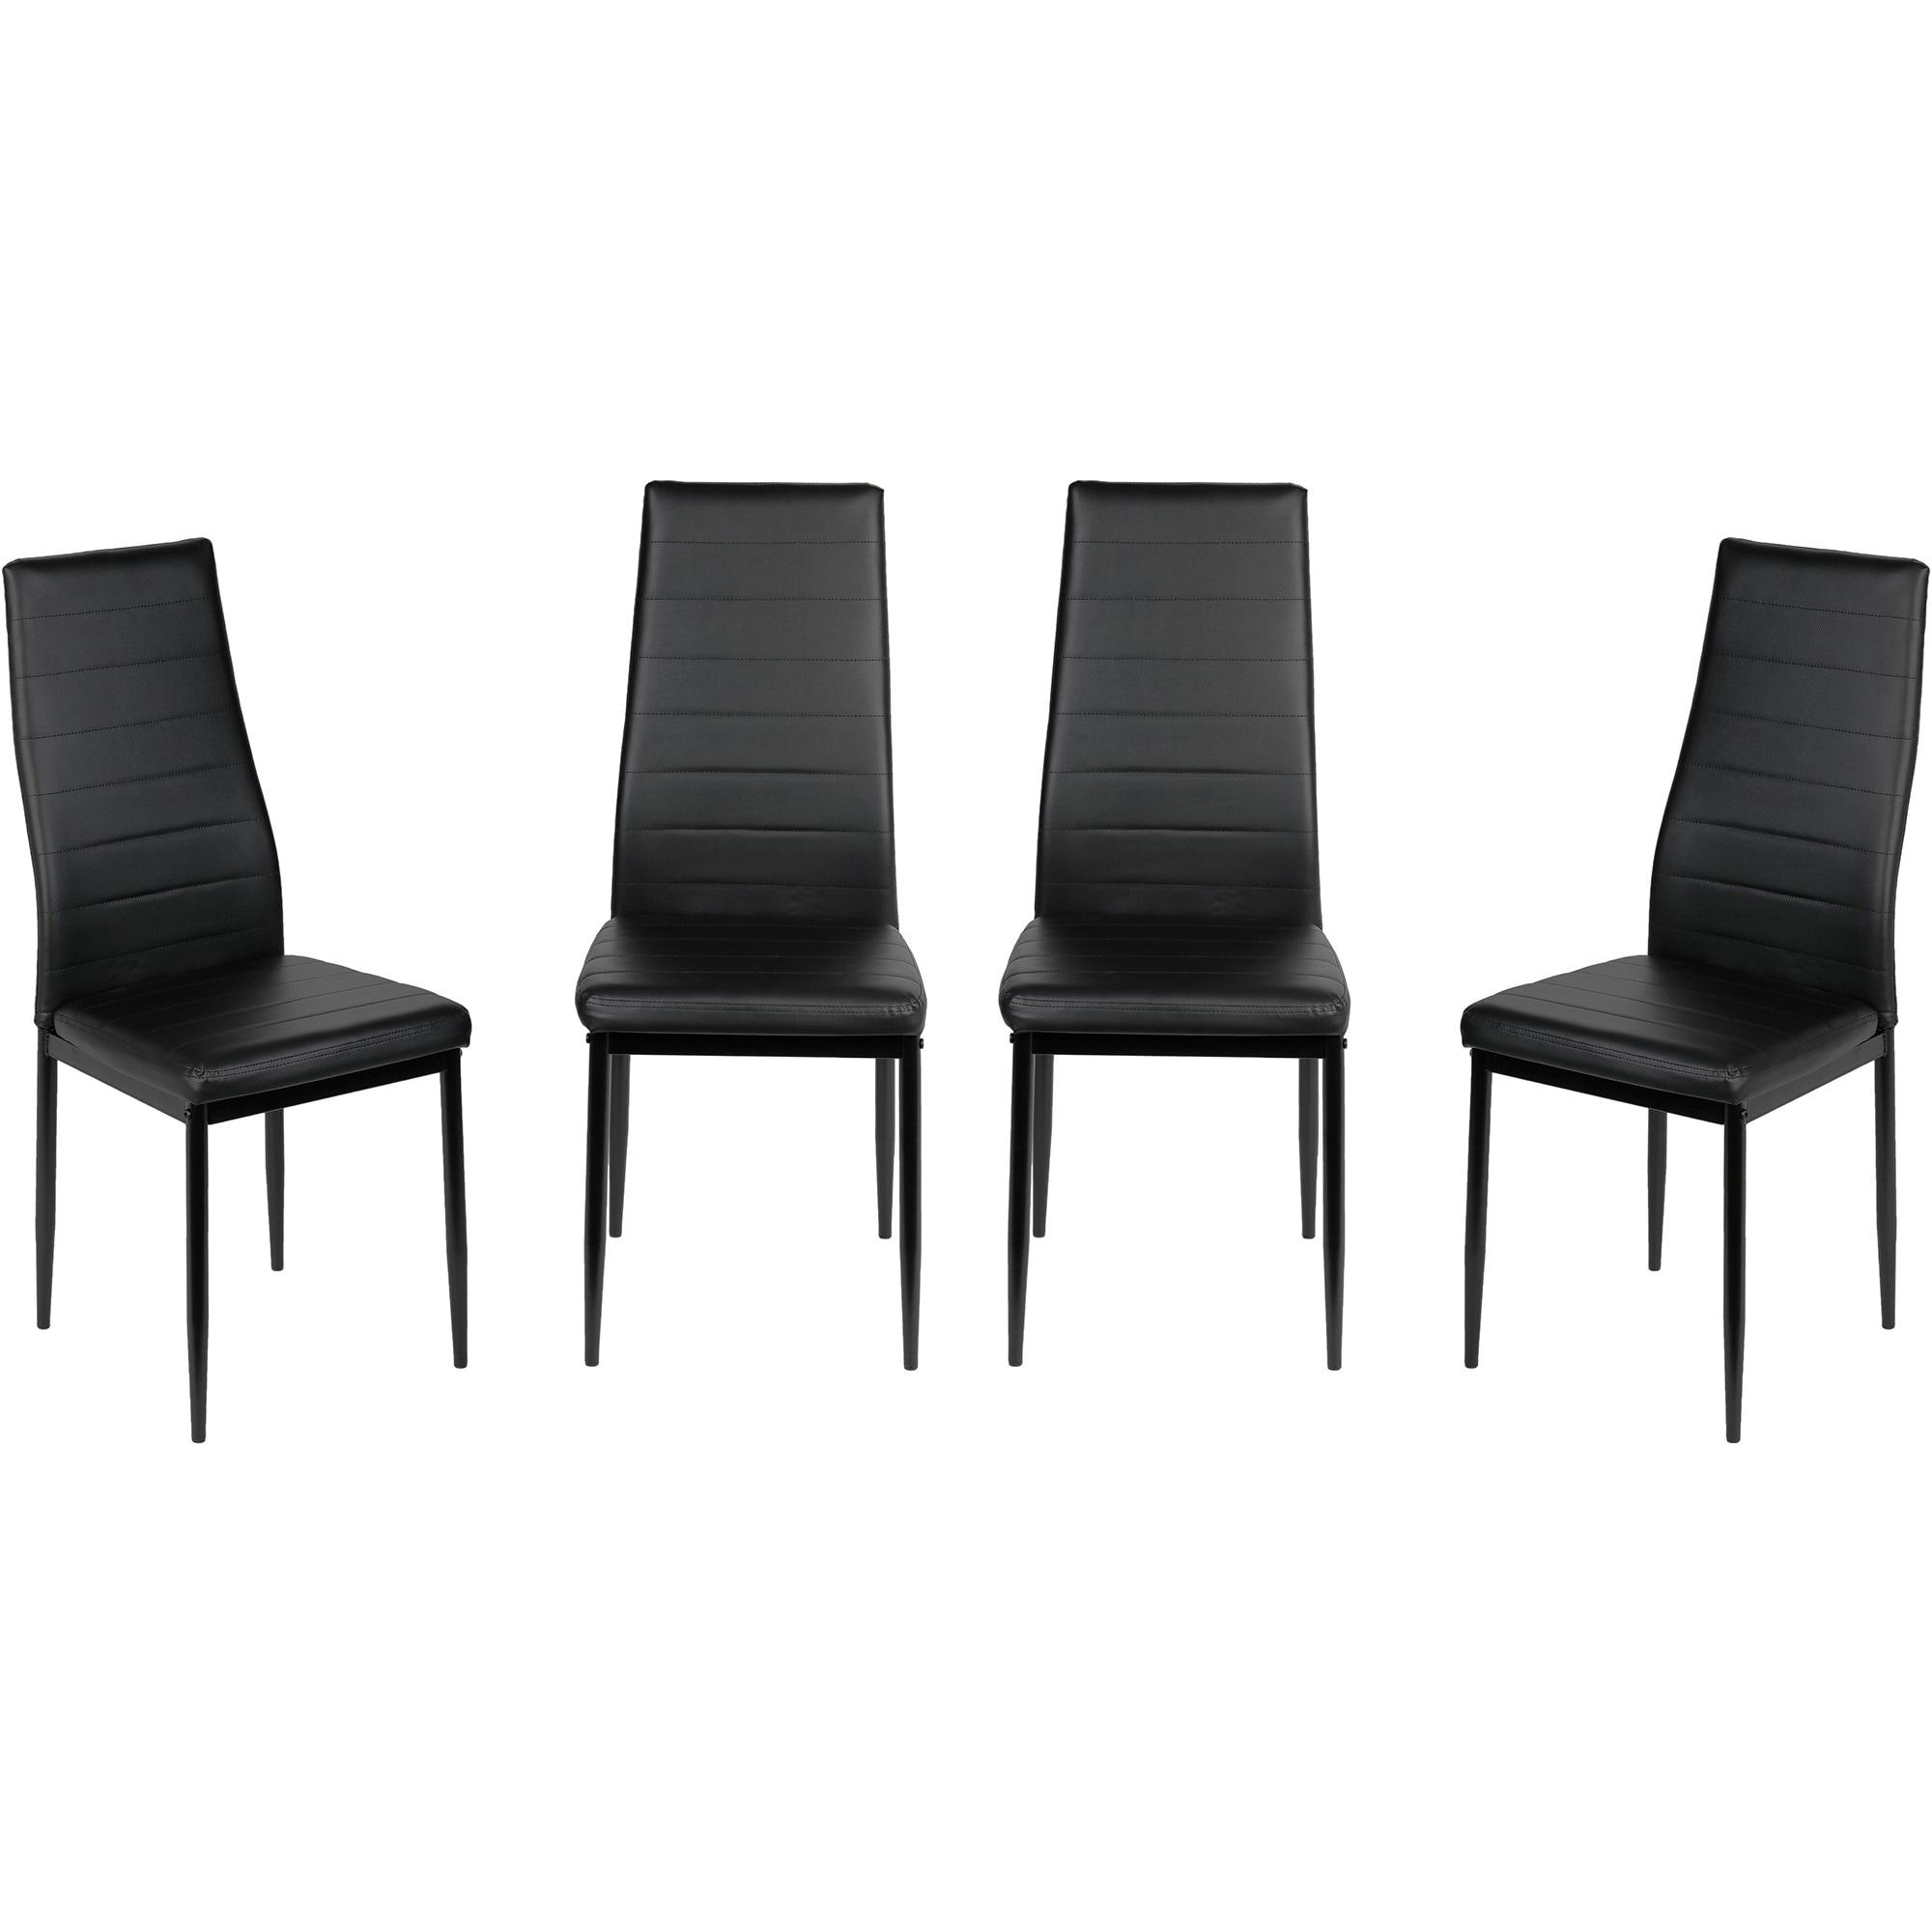 Fotografie Set 4 scaune bucatarie Kring Dublin, PU, Negru